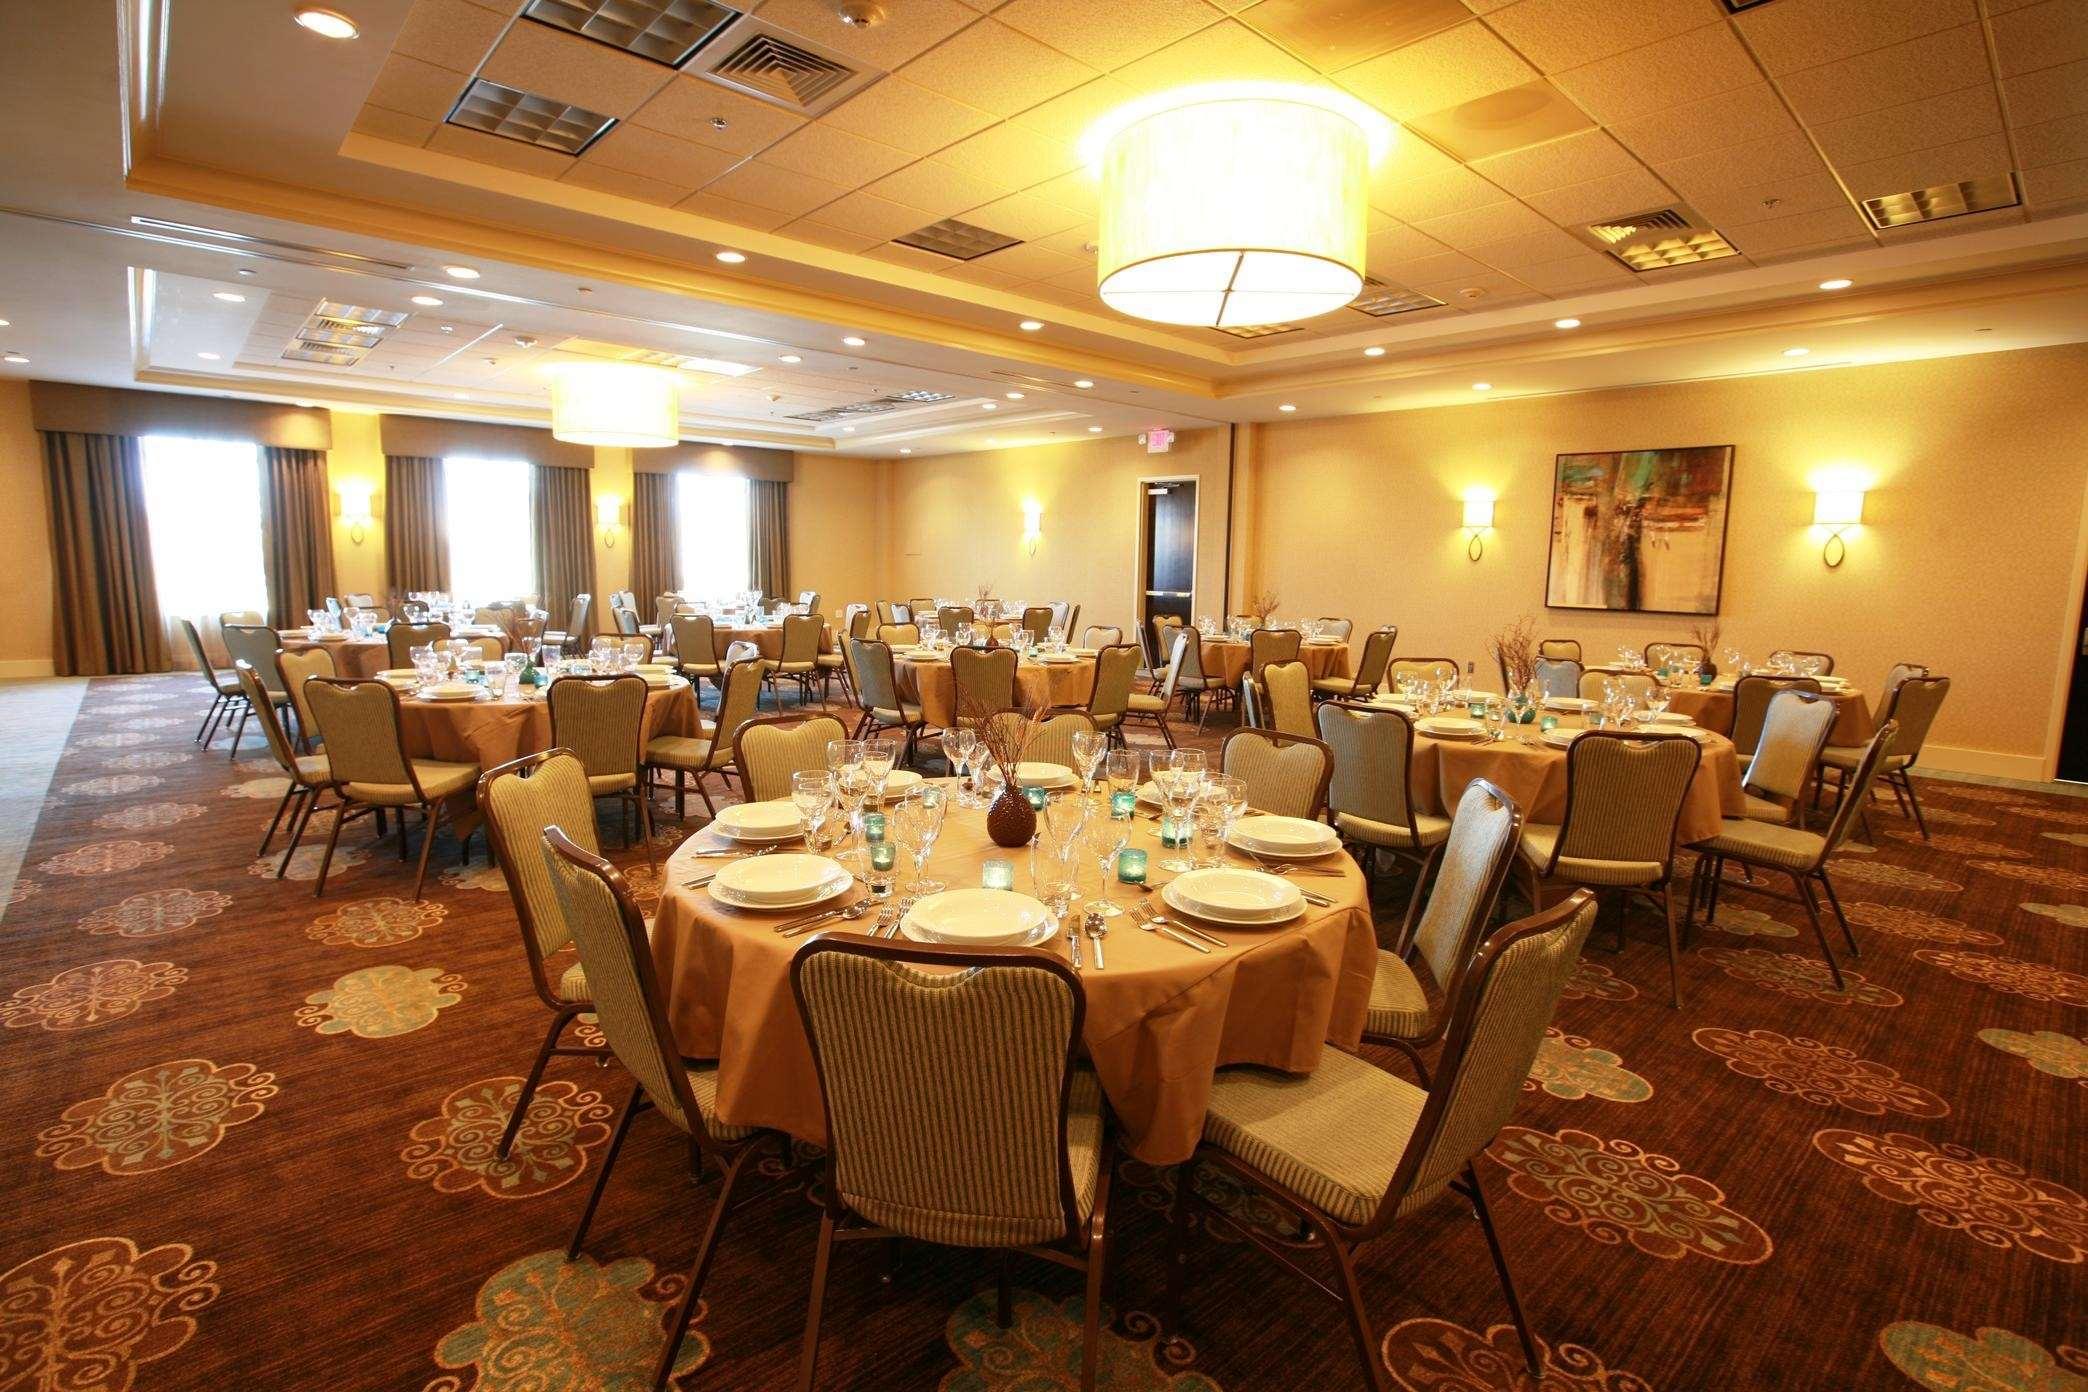 Hilton Garden Inn Charlotte/Concord image 15